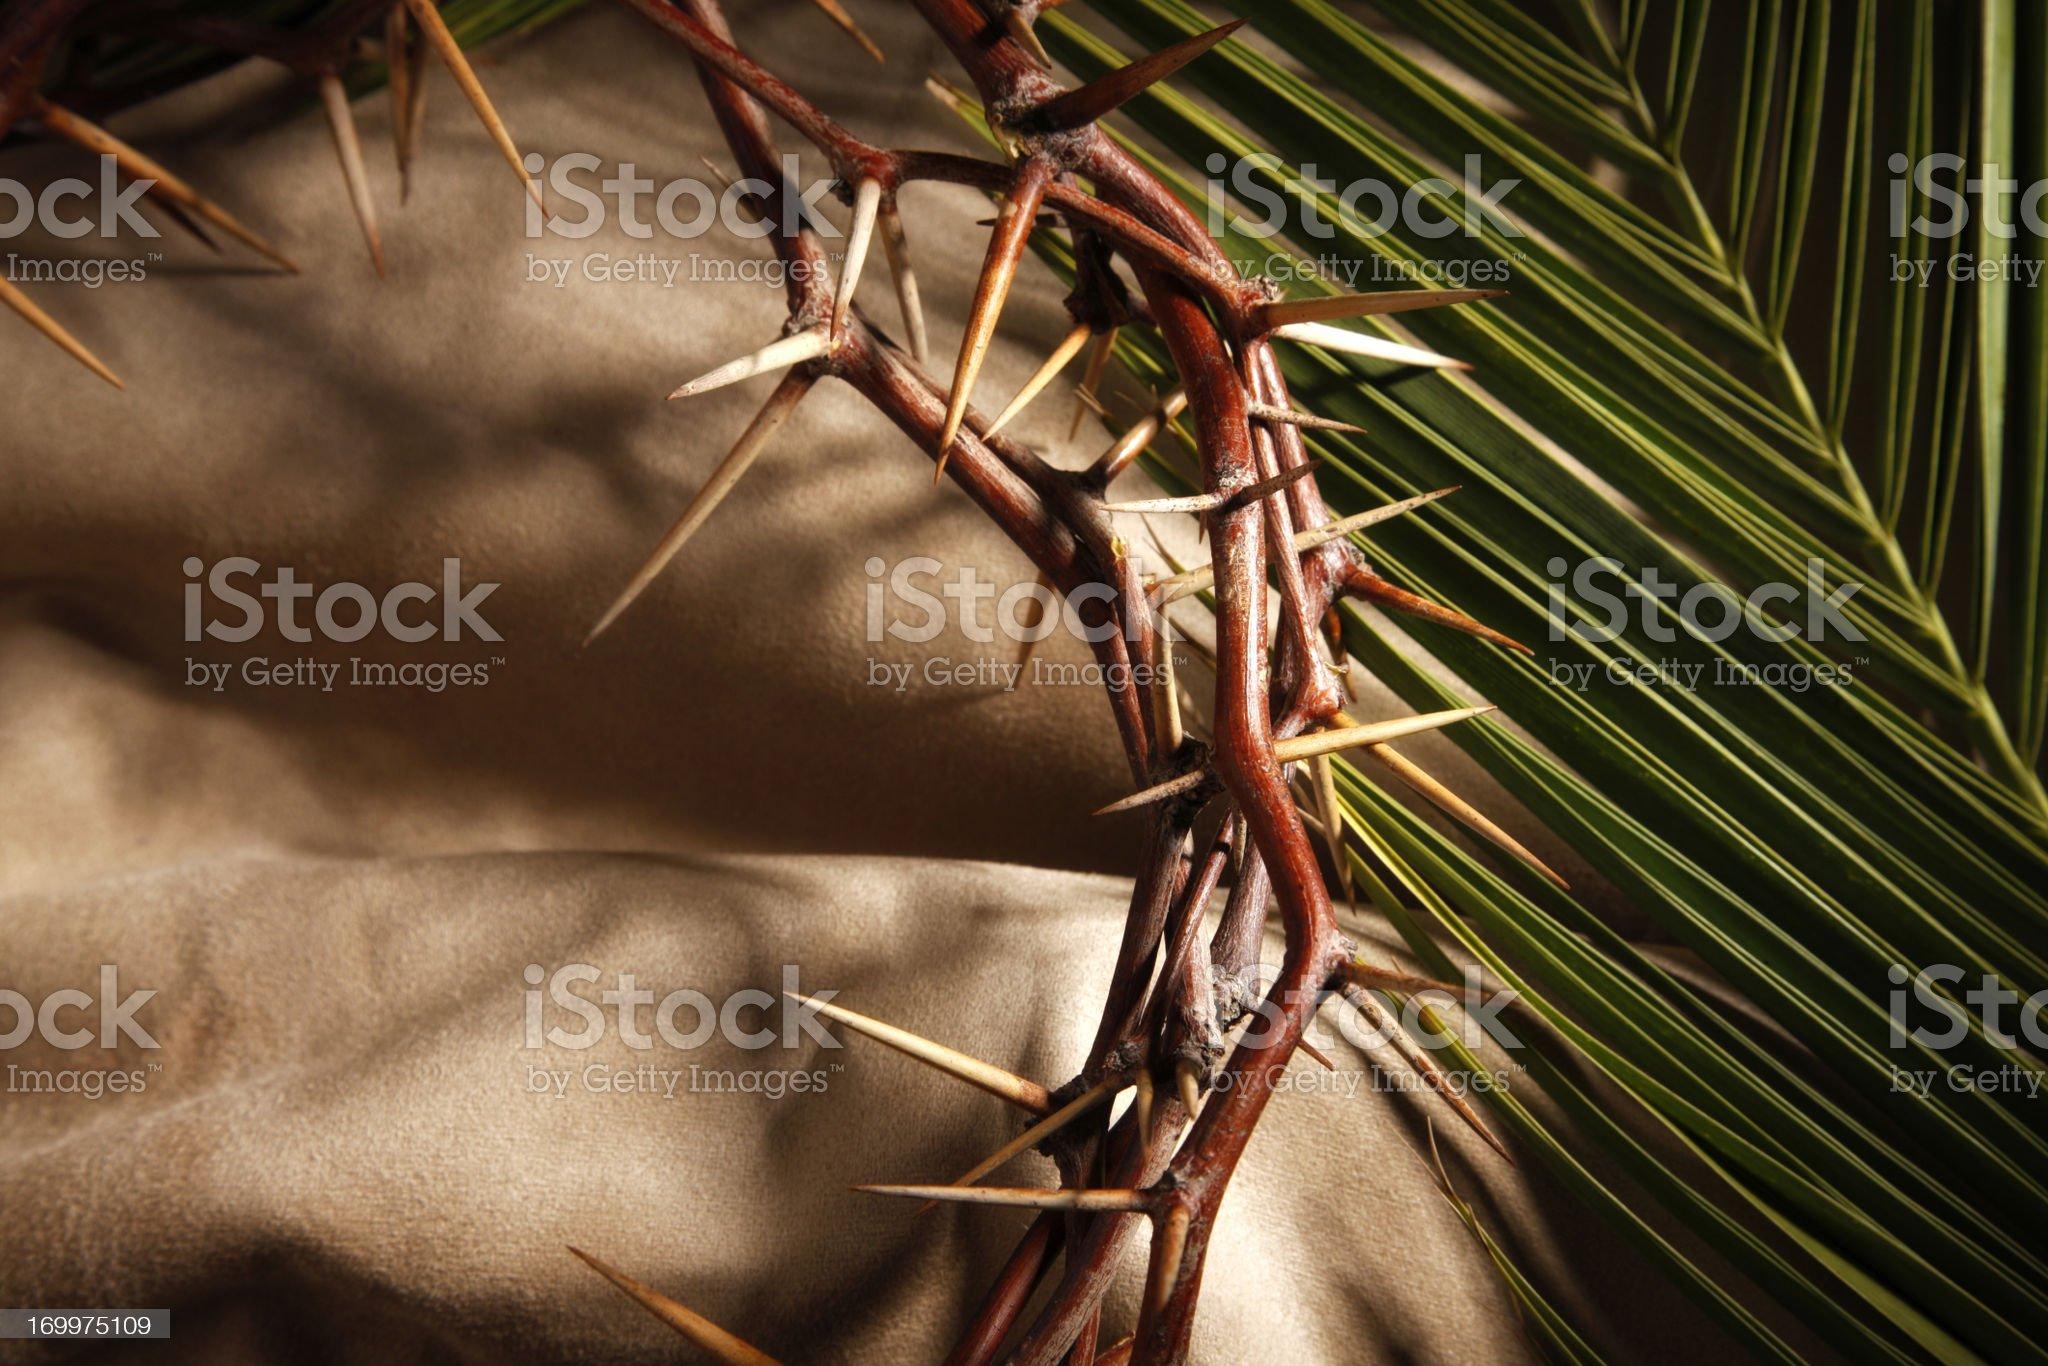 Good Friday and Palm Sunday royalty-free stock photo